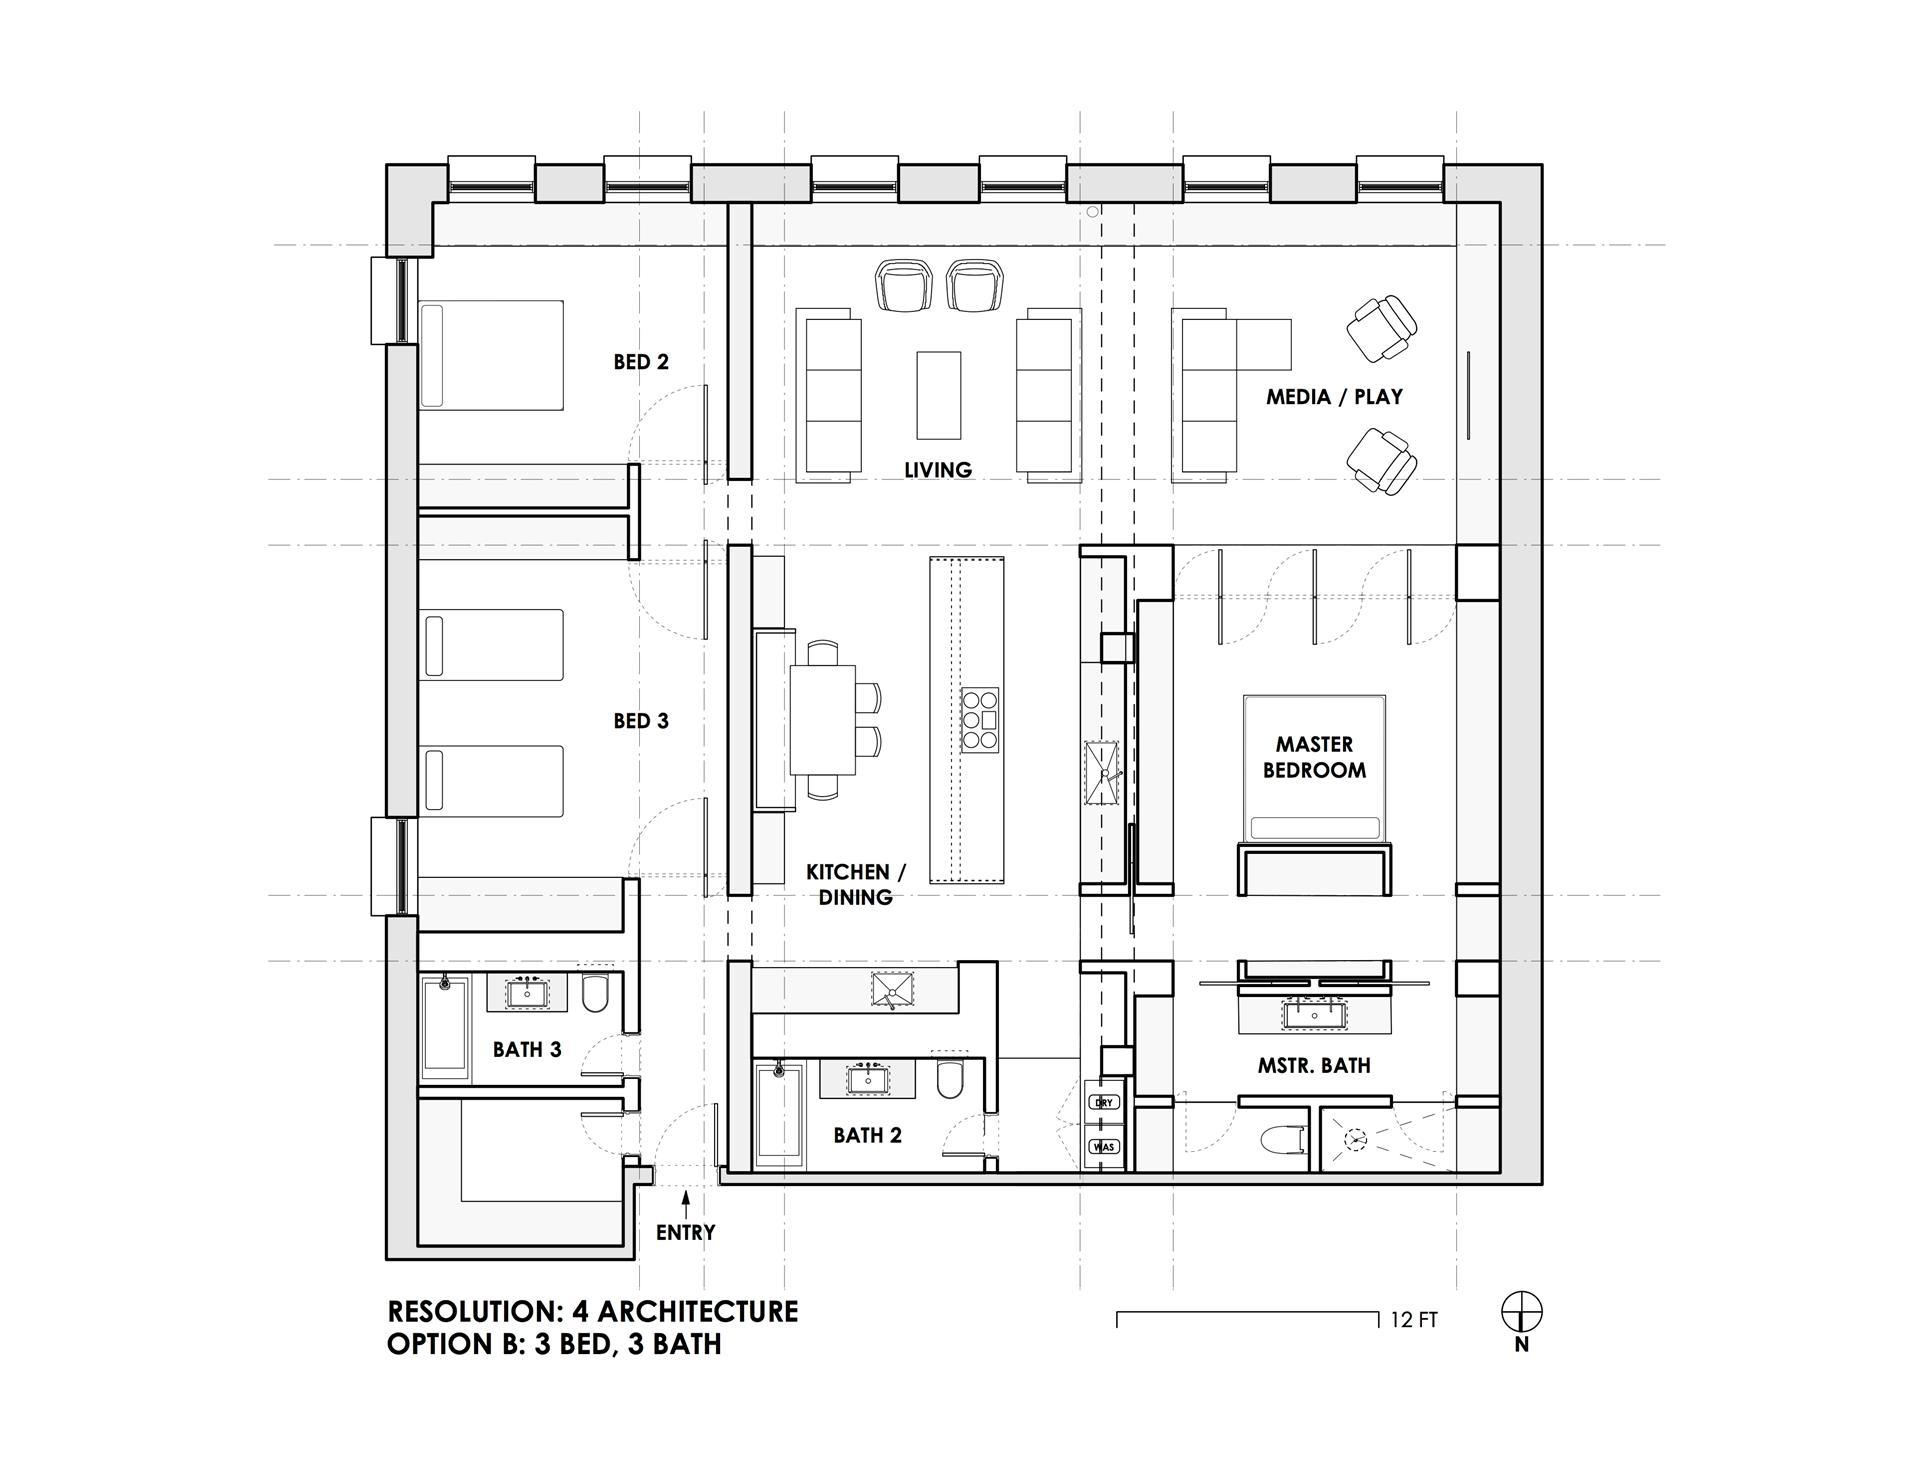 Floor plan of 60 Pineapple St, 6FG - Brooklyn Heights, New York